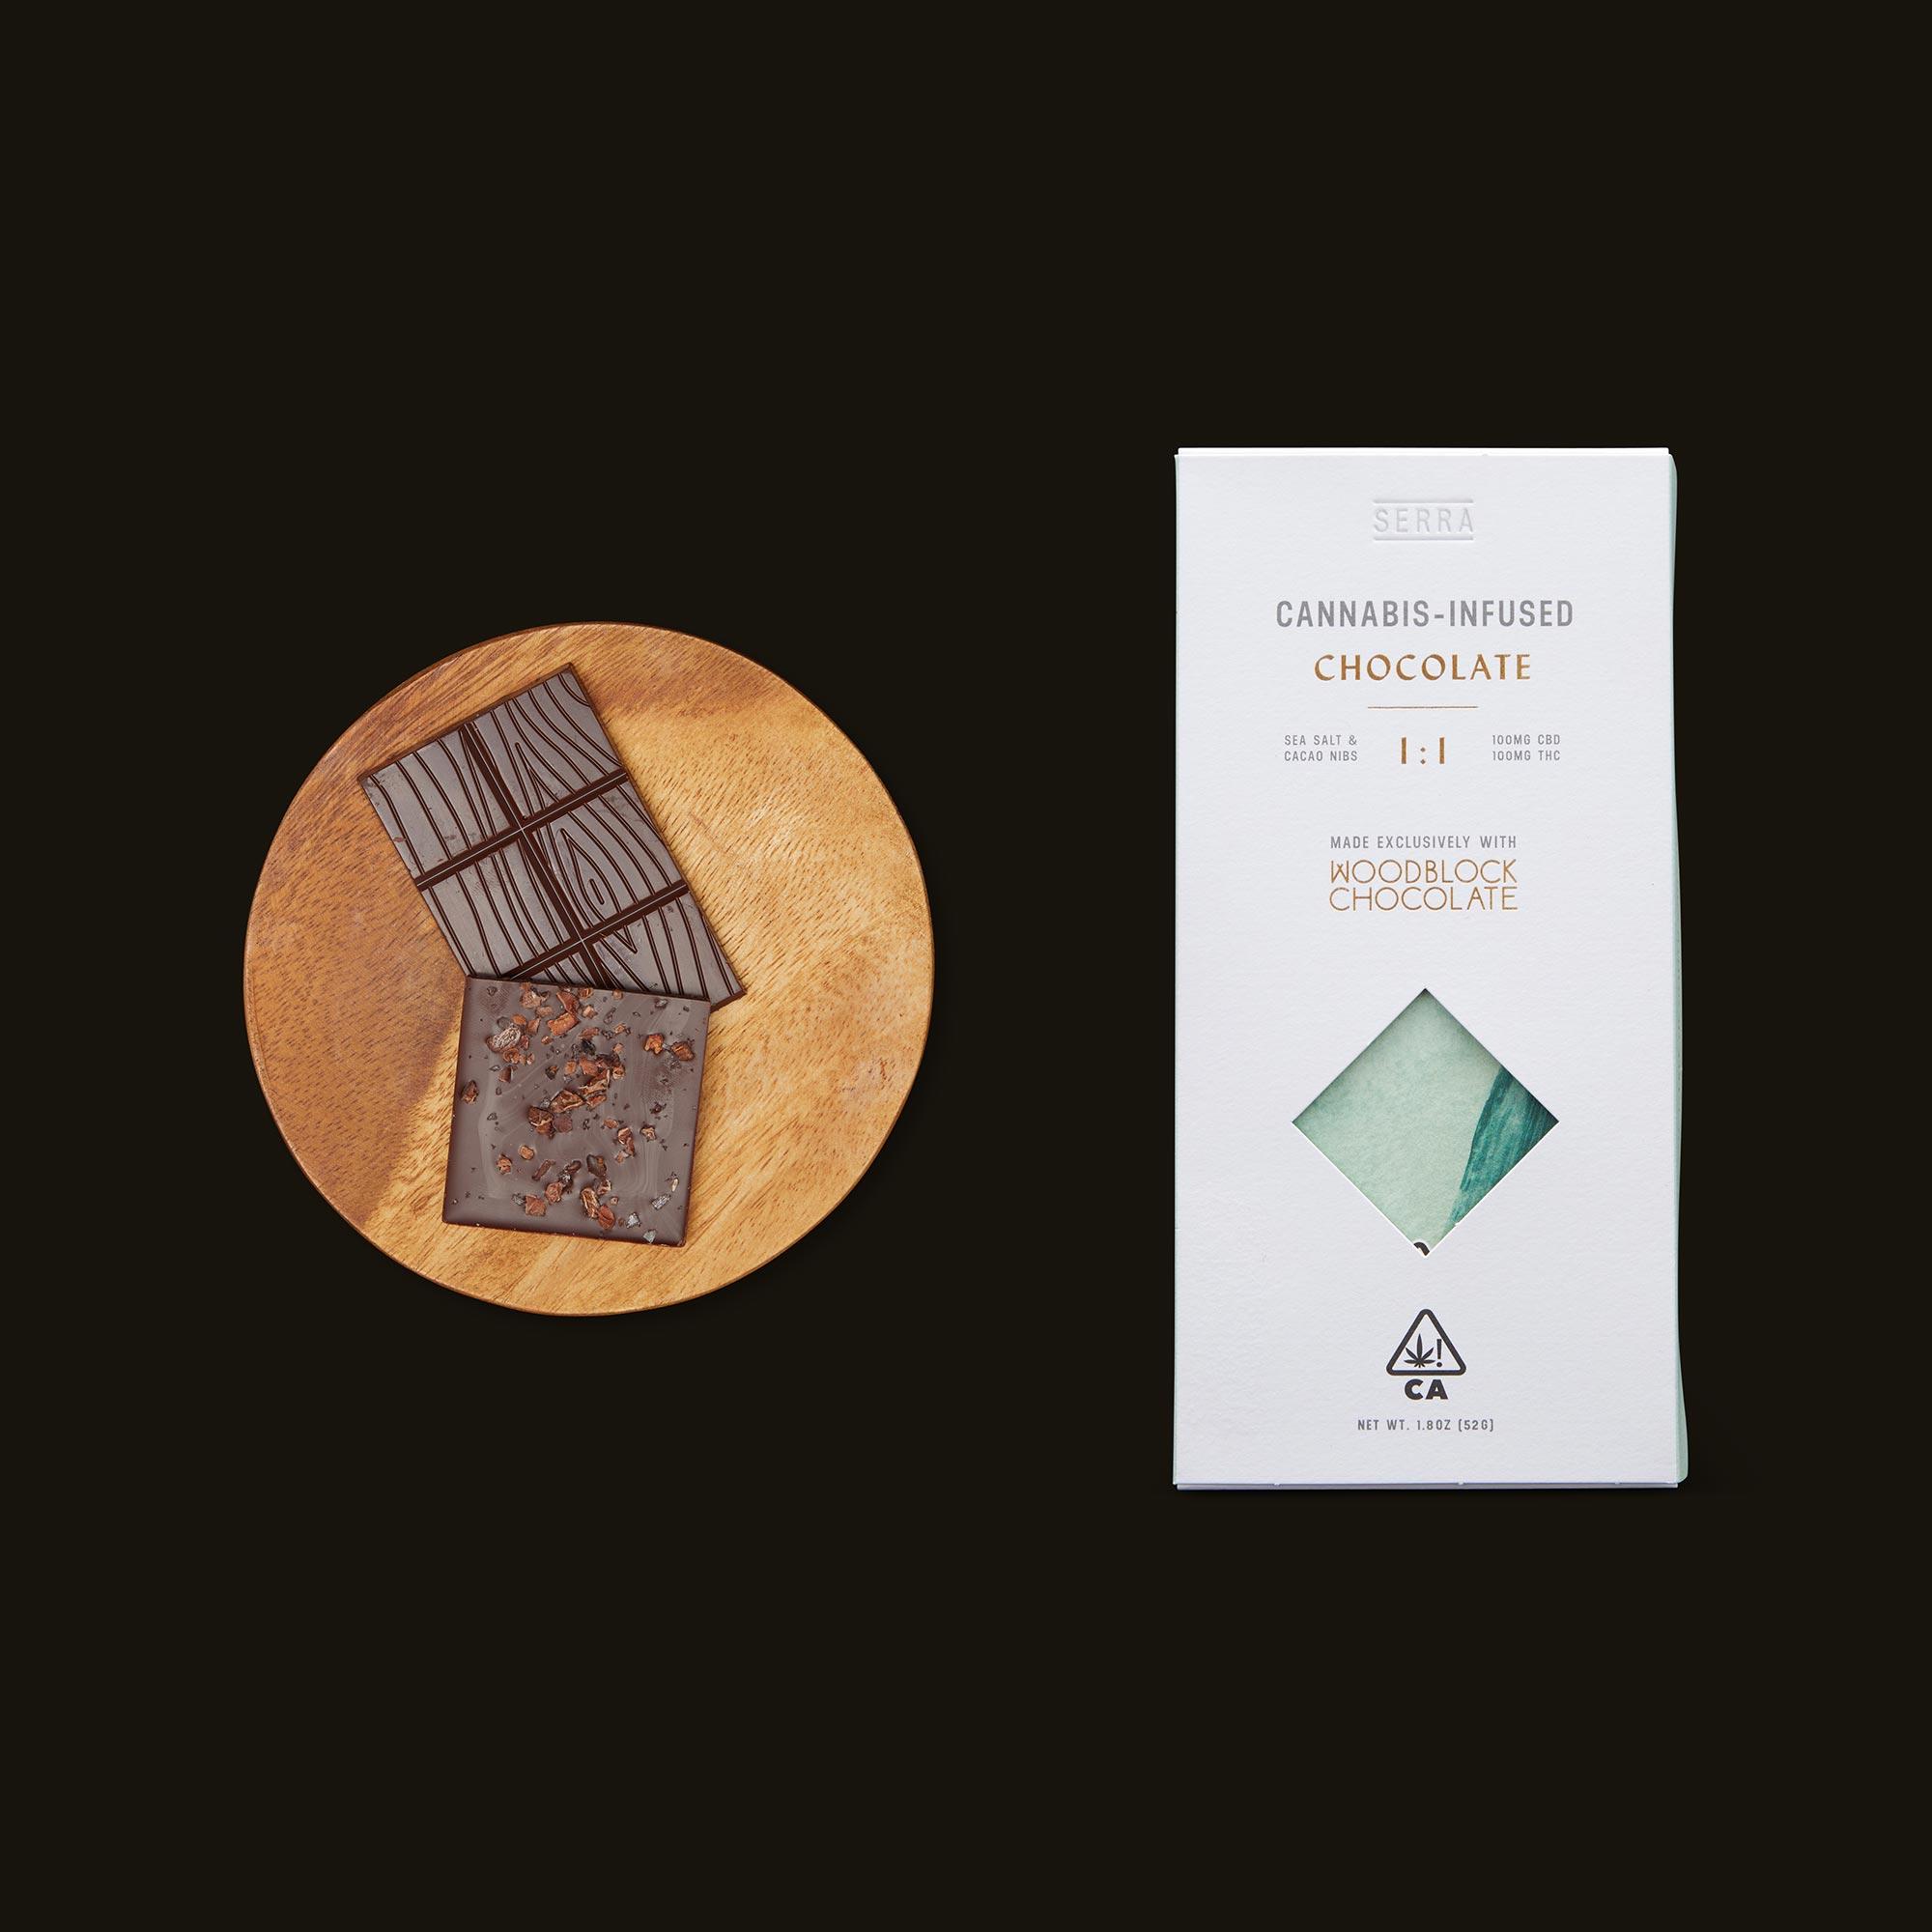 Serra Creativity 1:1 Salted Cacao Nib Chocolate